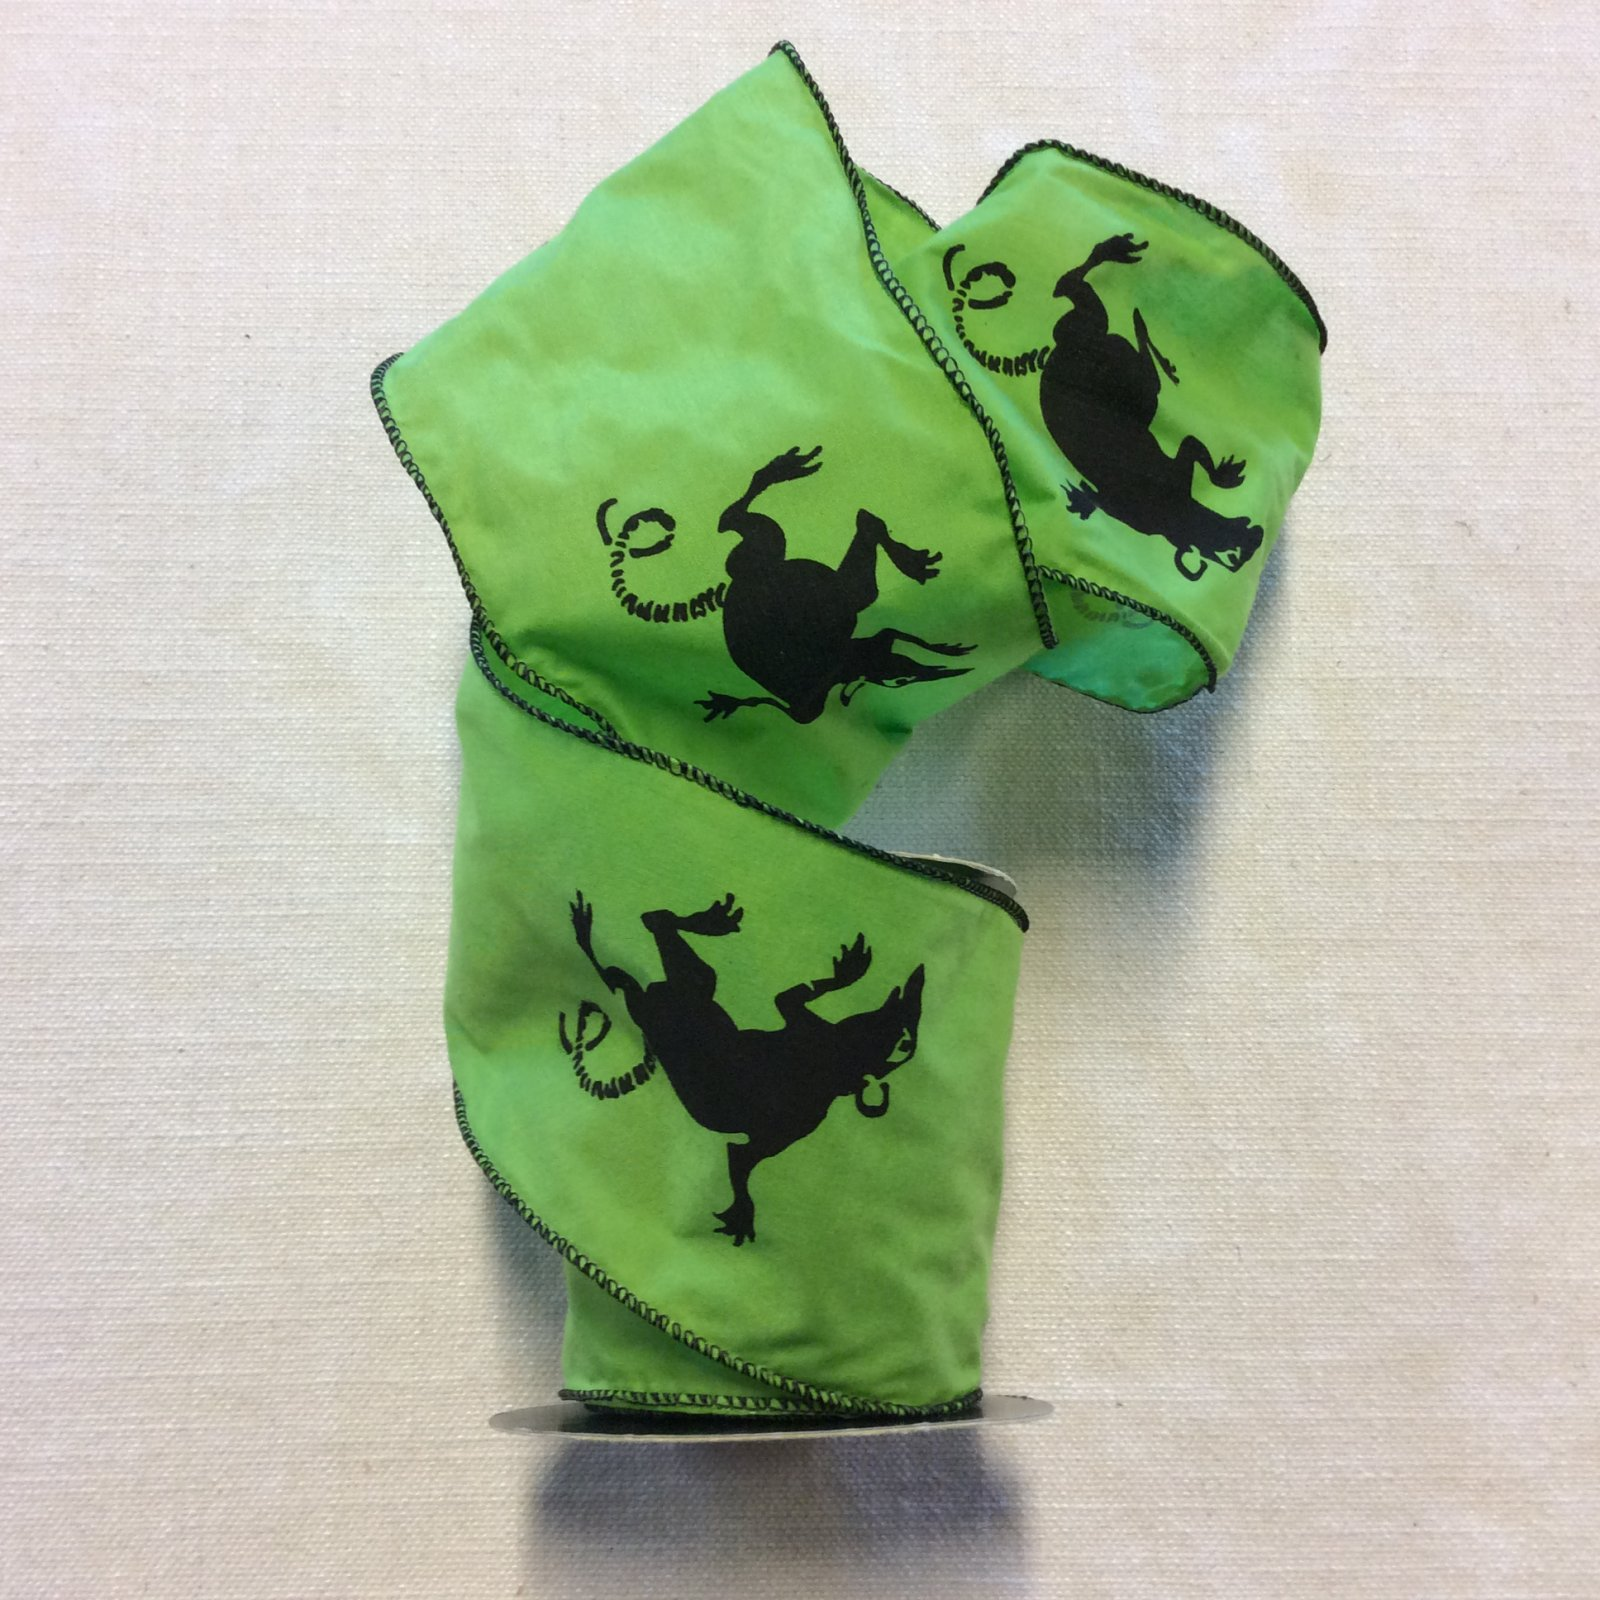 Toxic Rat Printed Lime Green Halloween Wired Ribbon Decor Trim RIB1374